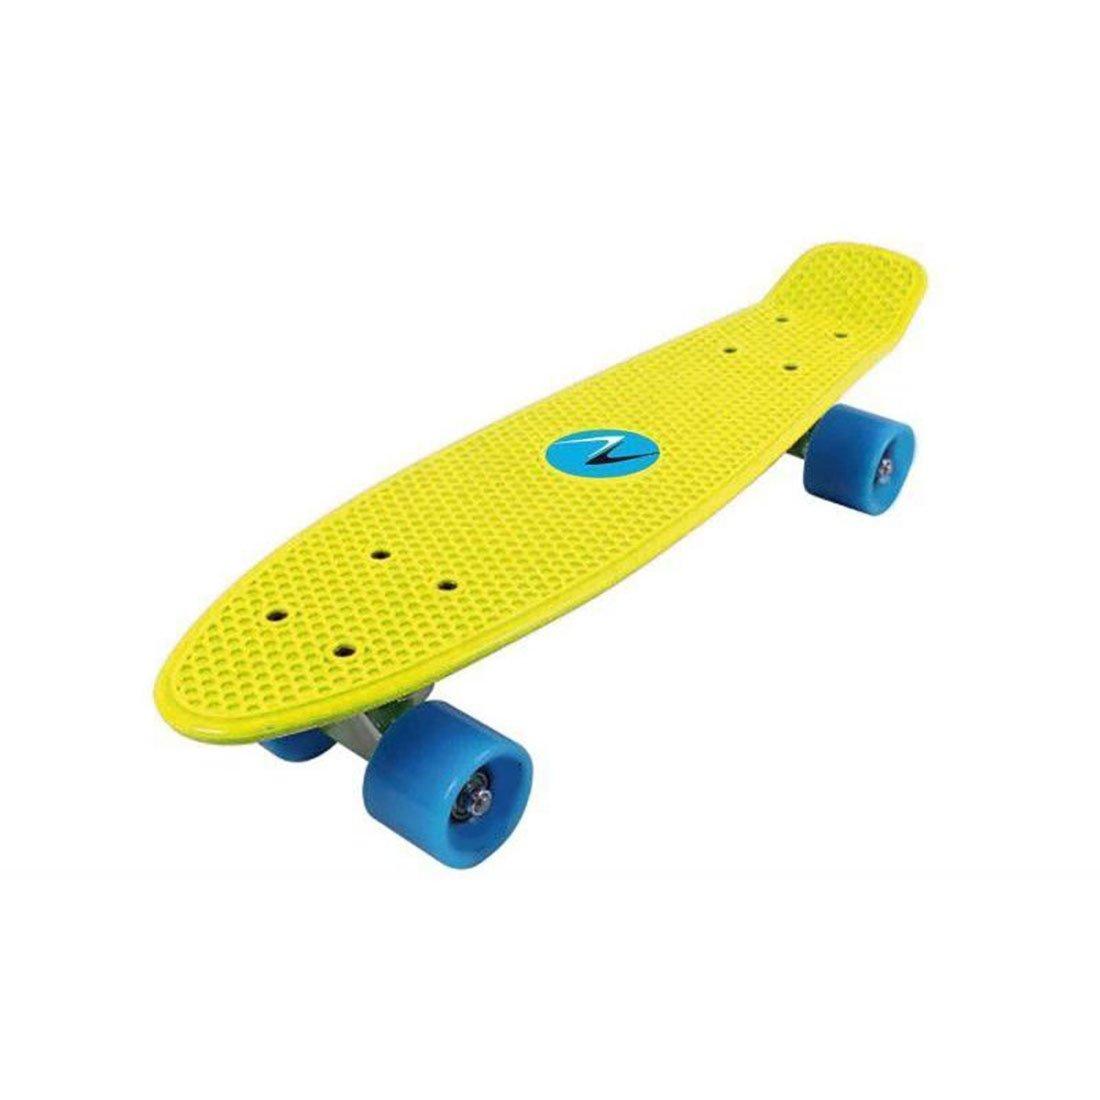 Skateboard penny board DHS Nextreme Freedom, galben imagine